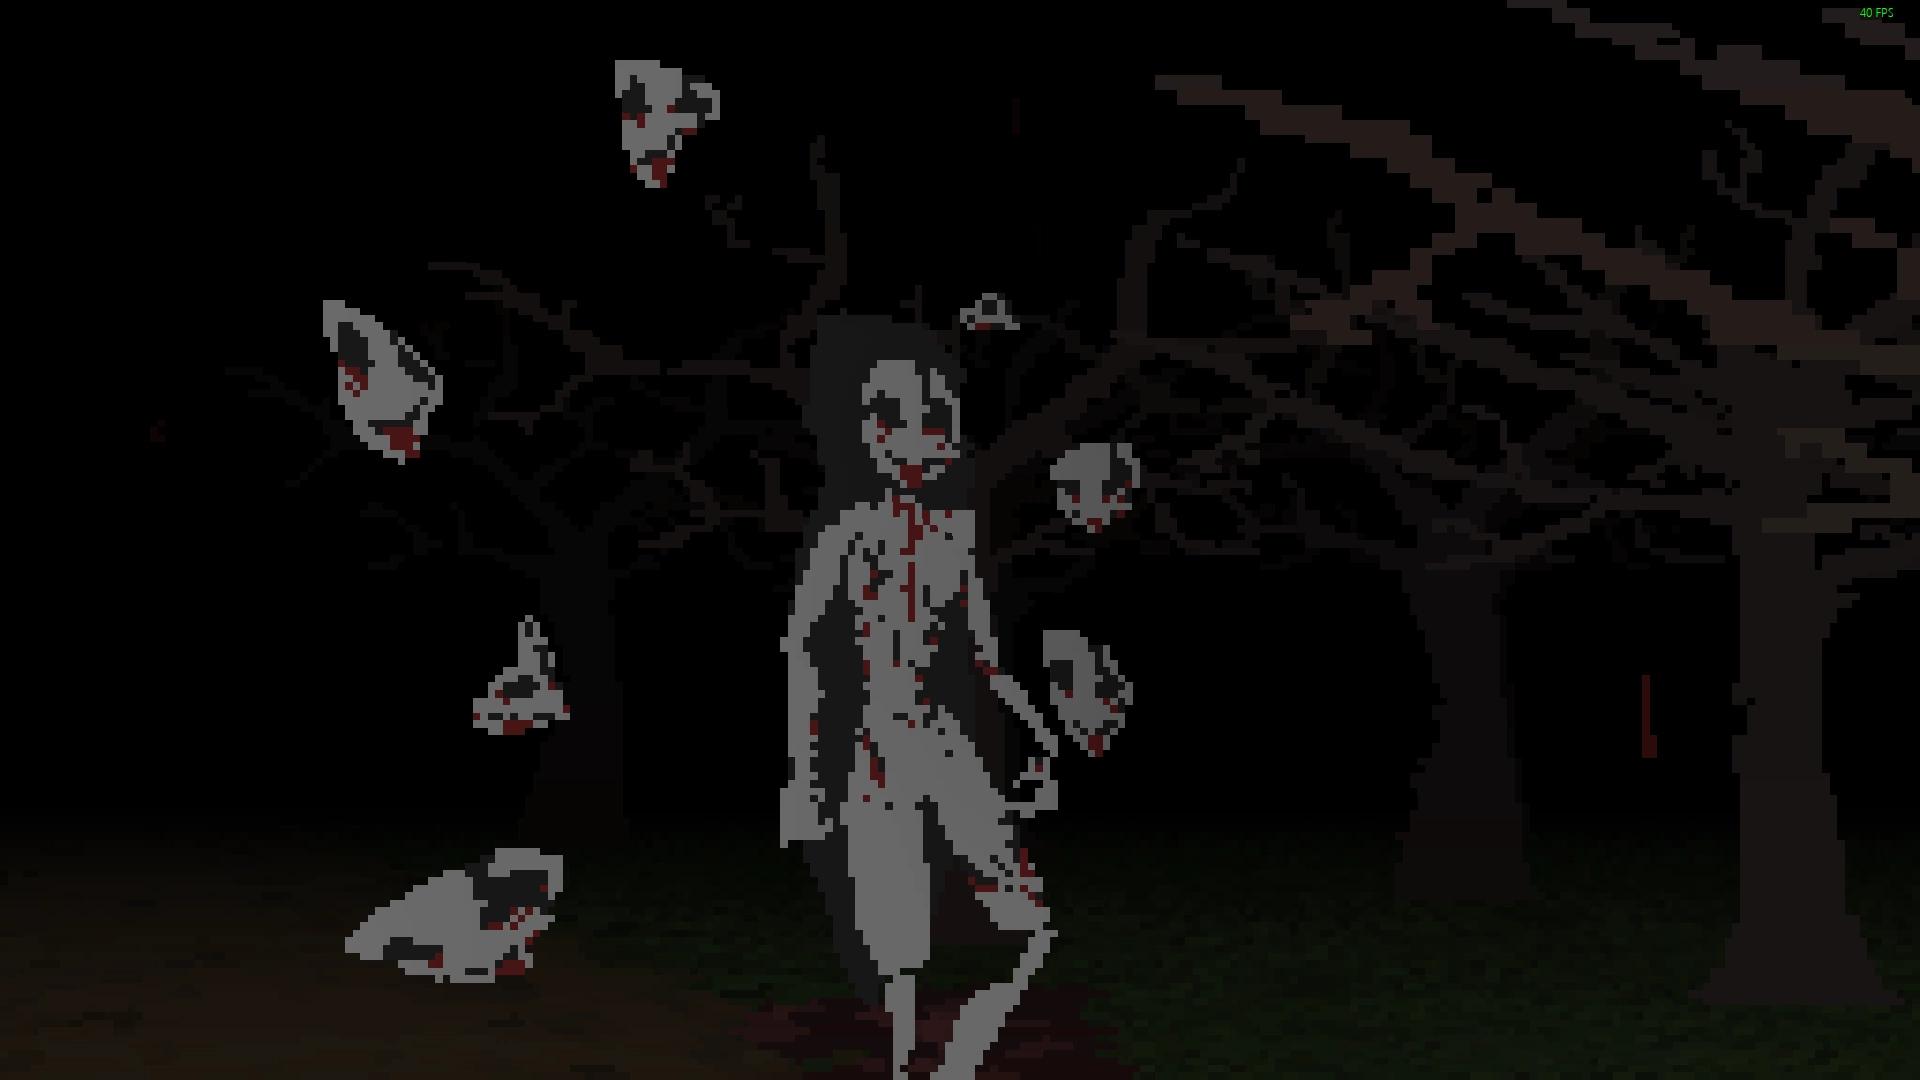 IMSCARED:A Pixelated Nightmare